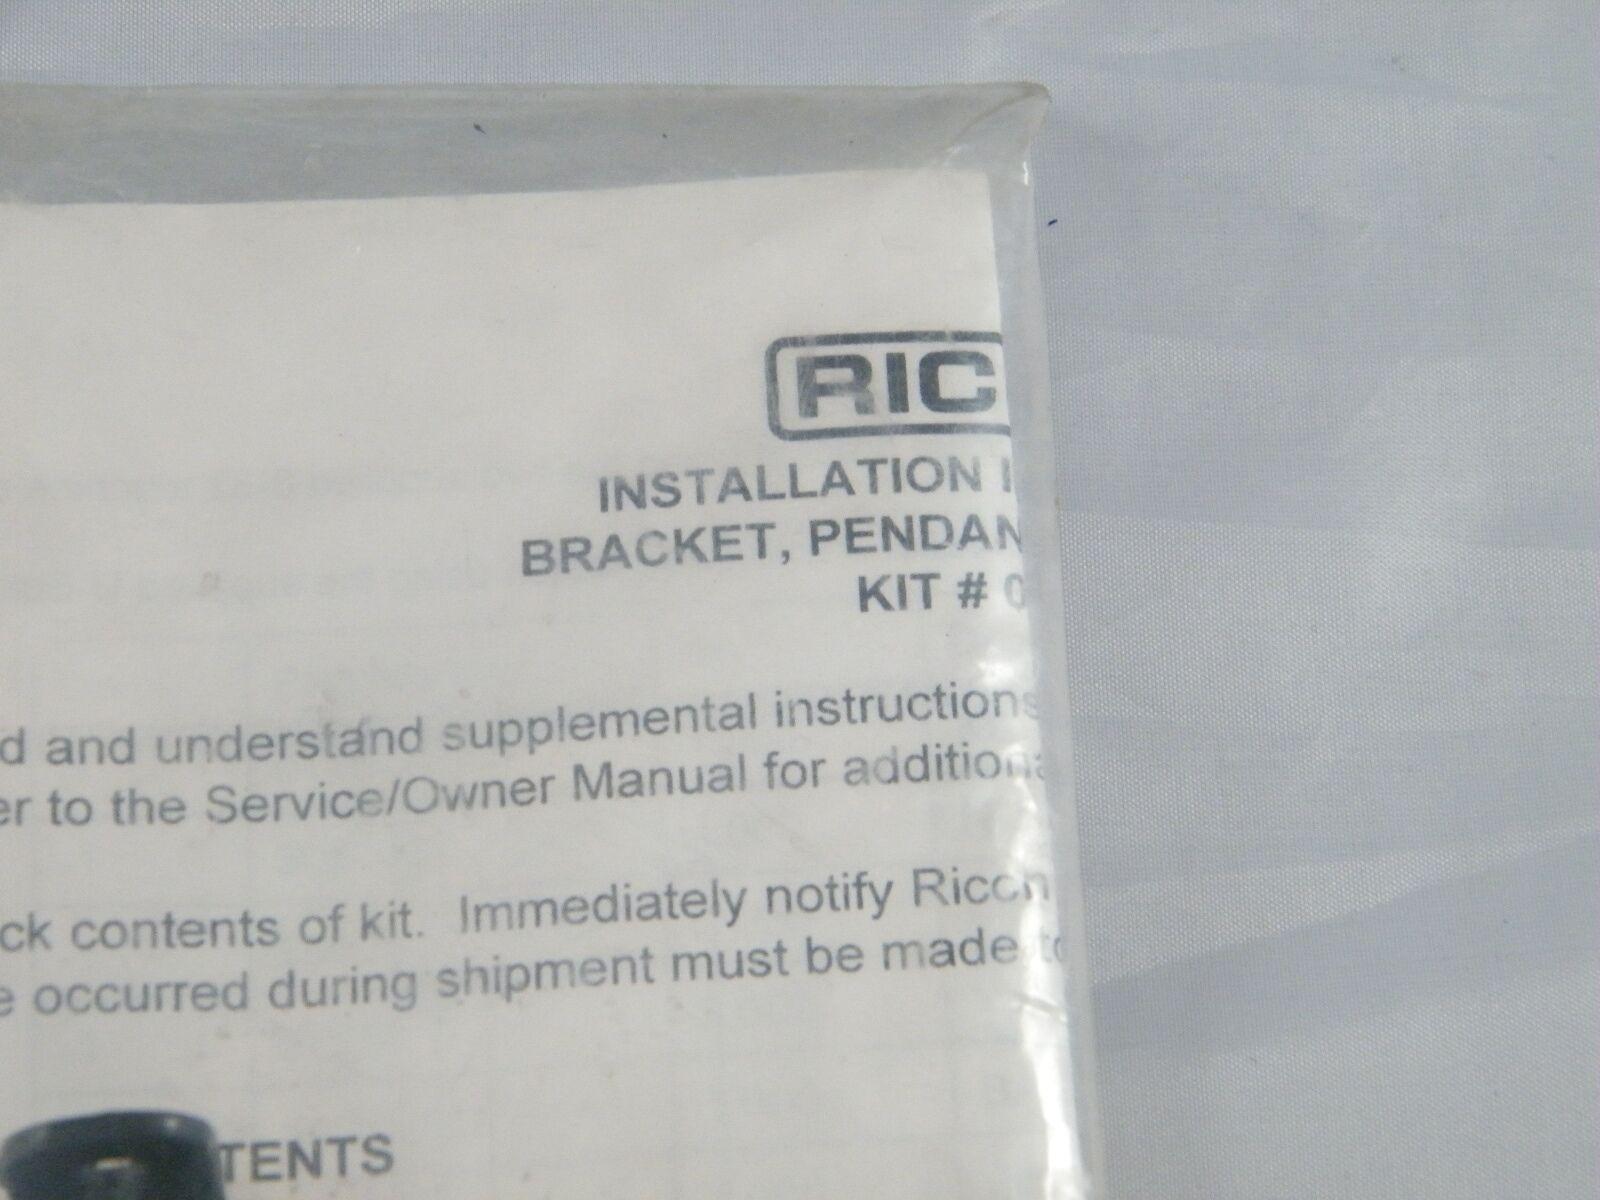 RICON ~ BRACKET PENDANT STRAIN RELIEF KIT ~ PART NUMBER 01007